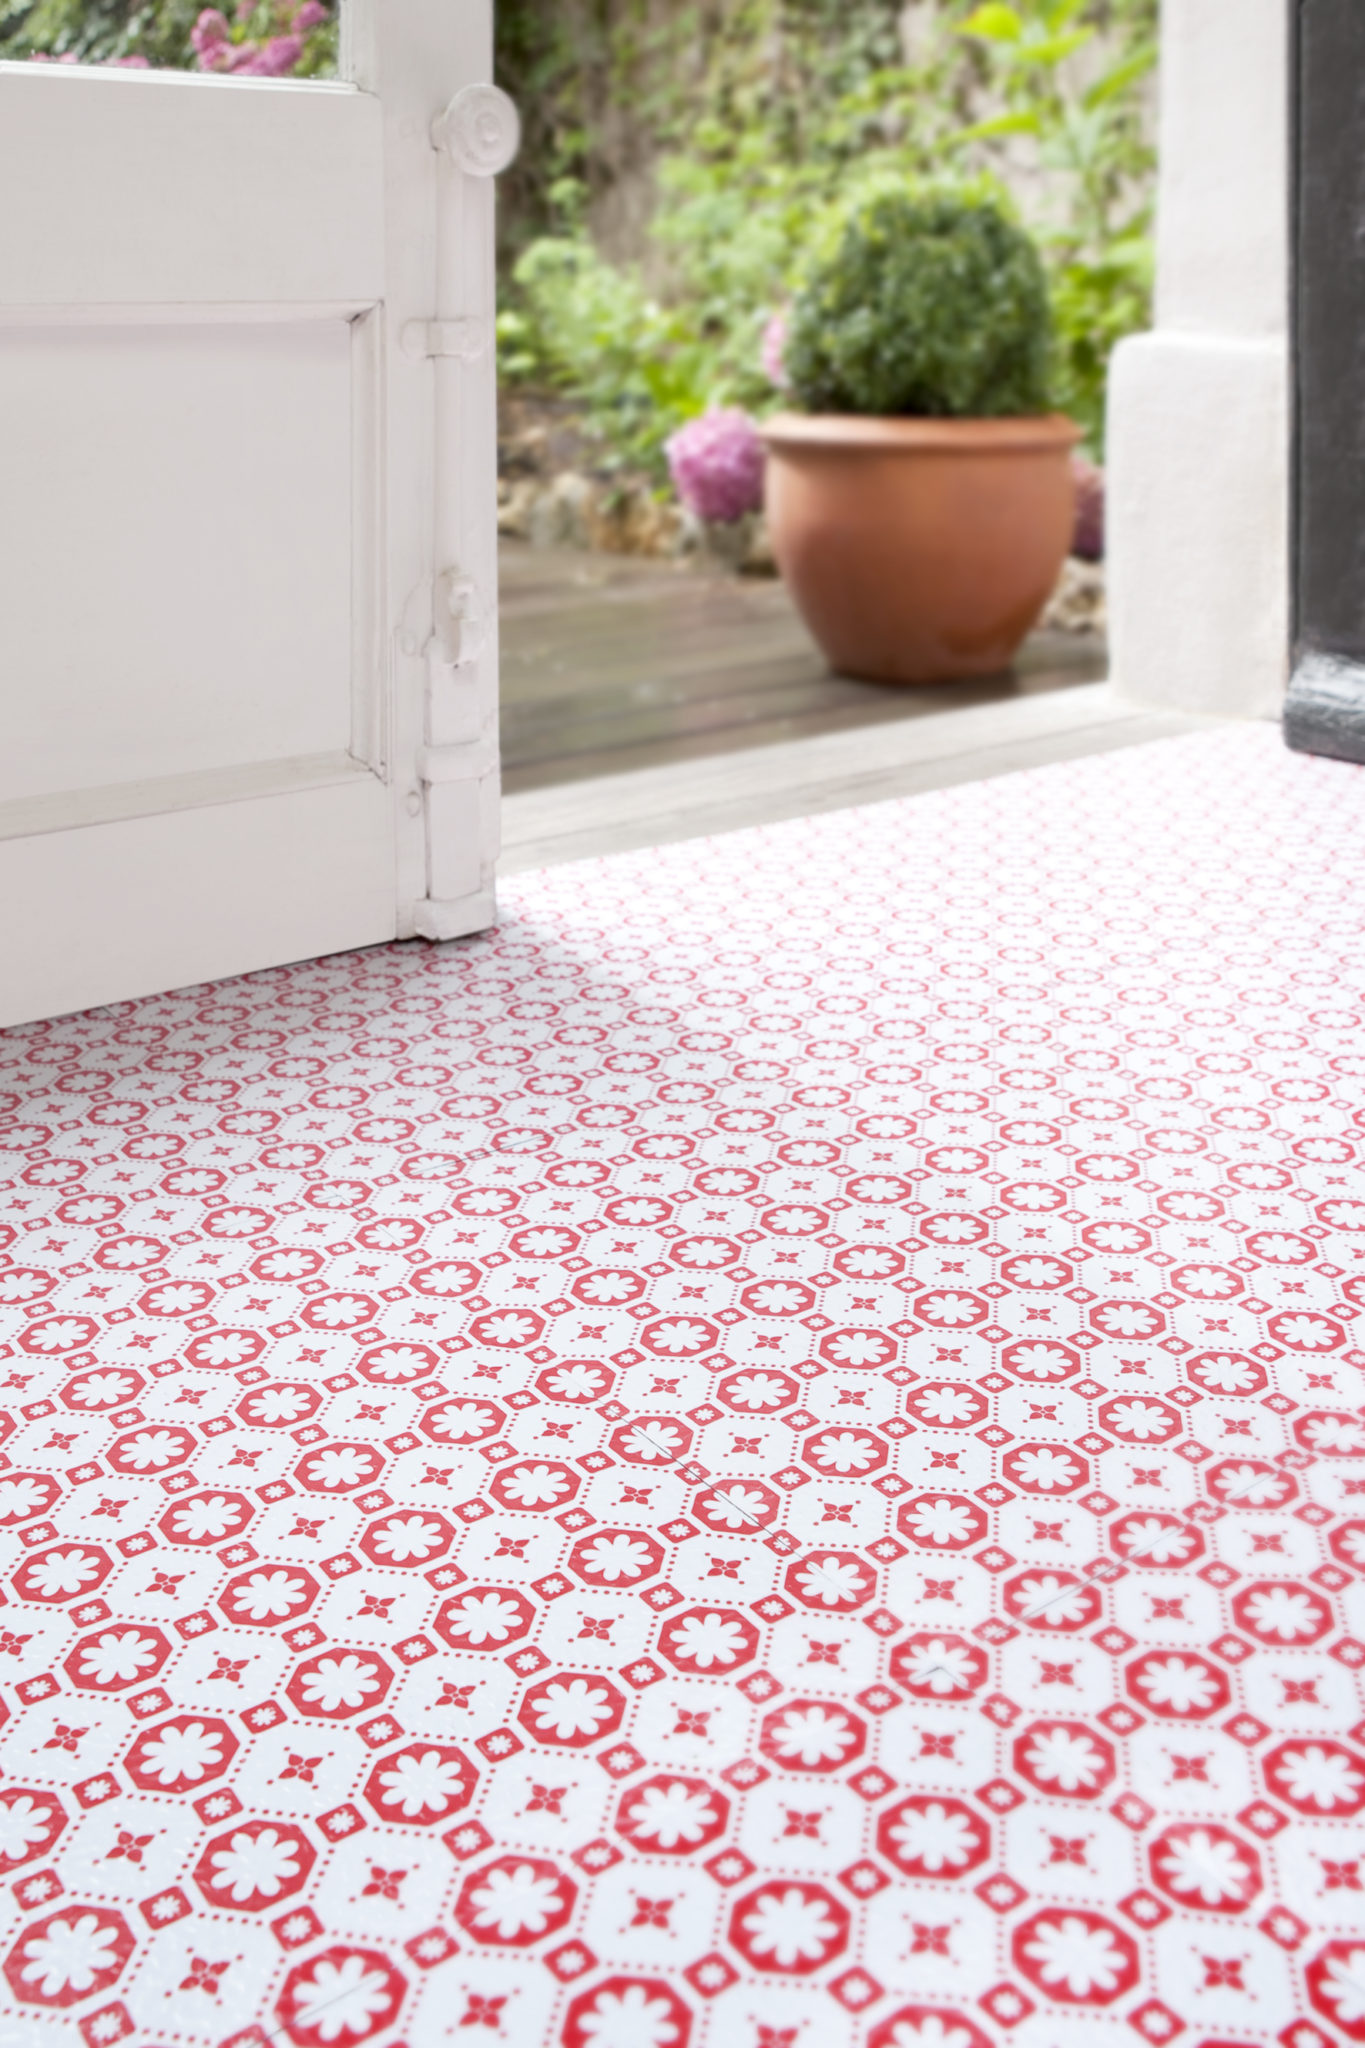 Samples vinyl floor tiles rose des vents red vinyl floor tiles dailygadgetfo Images